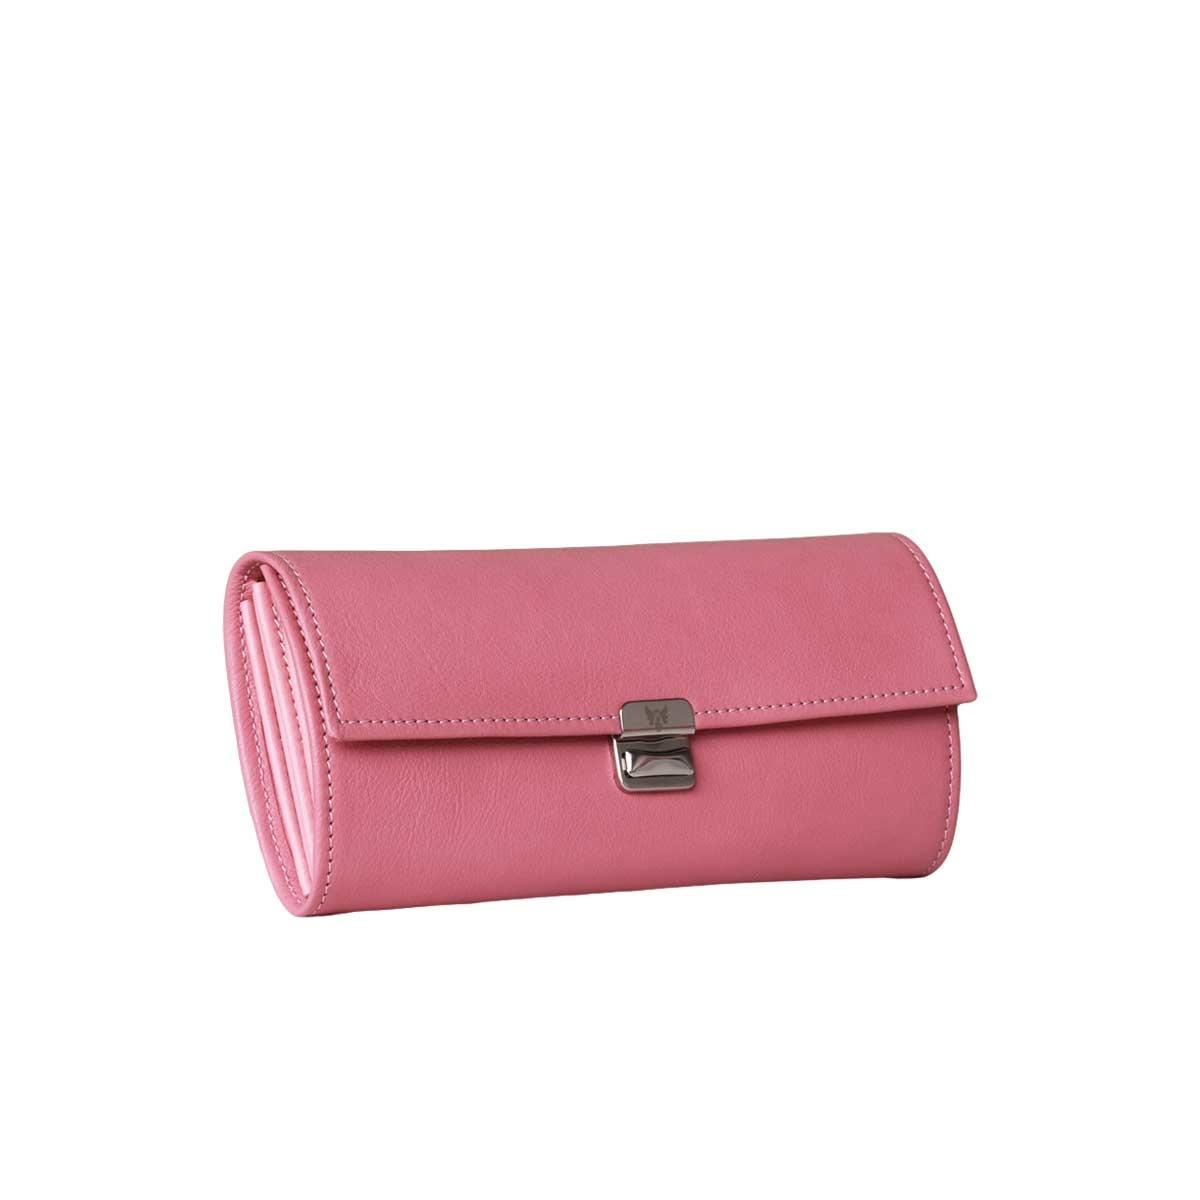 lange leder geldbörsen echtleder rosa kaufen